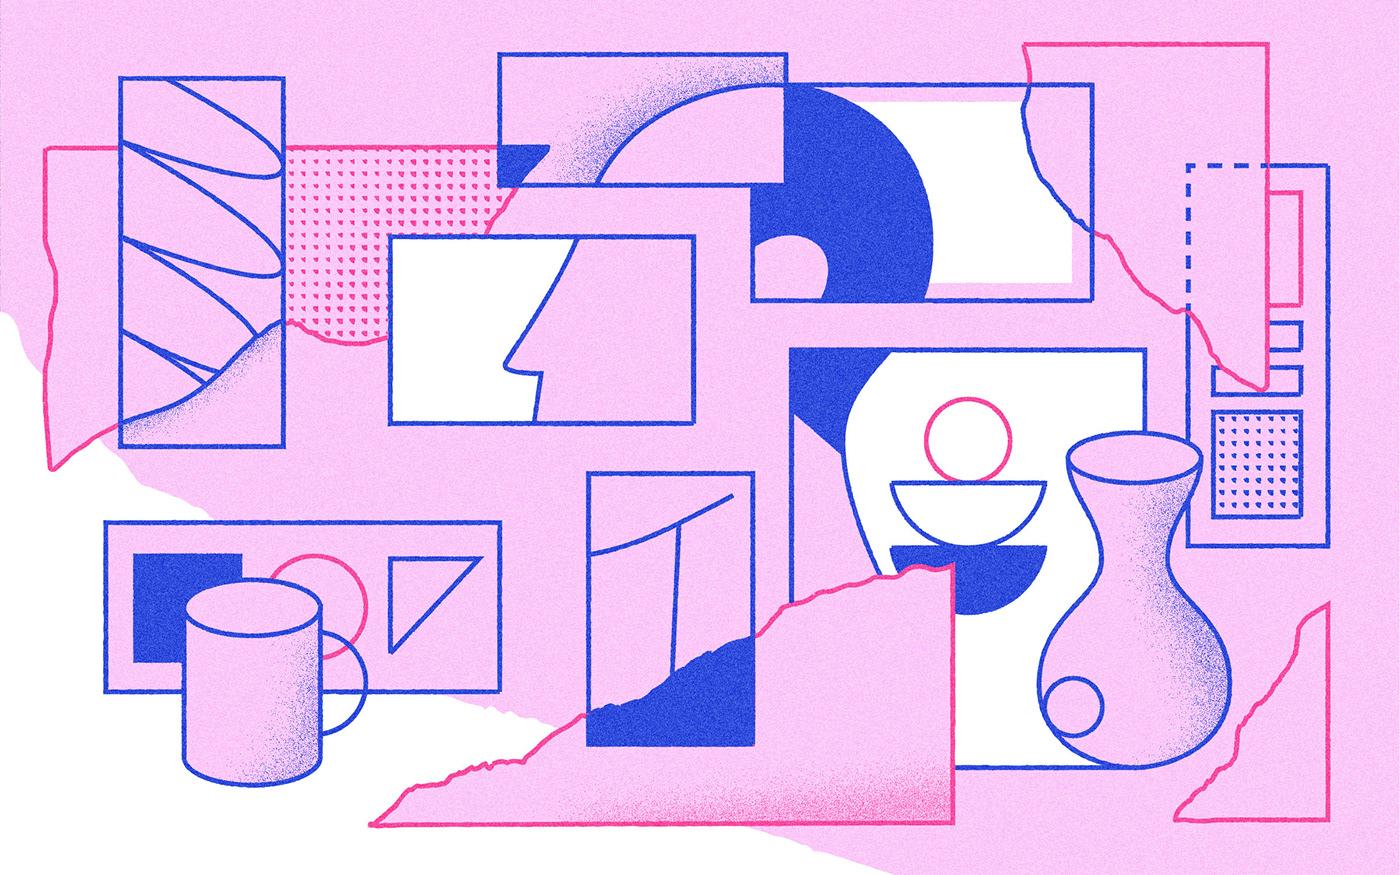 medium Modus design Approaches tools artboards grid